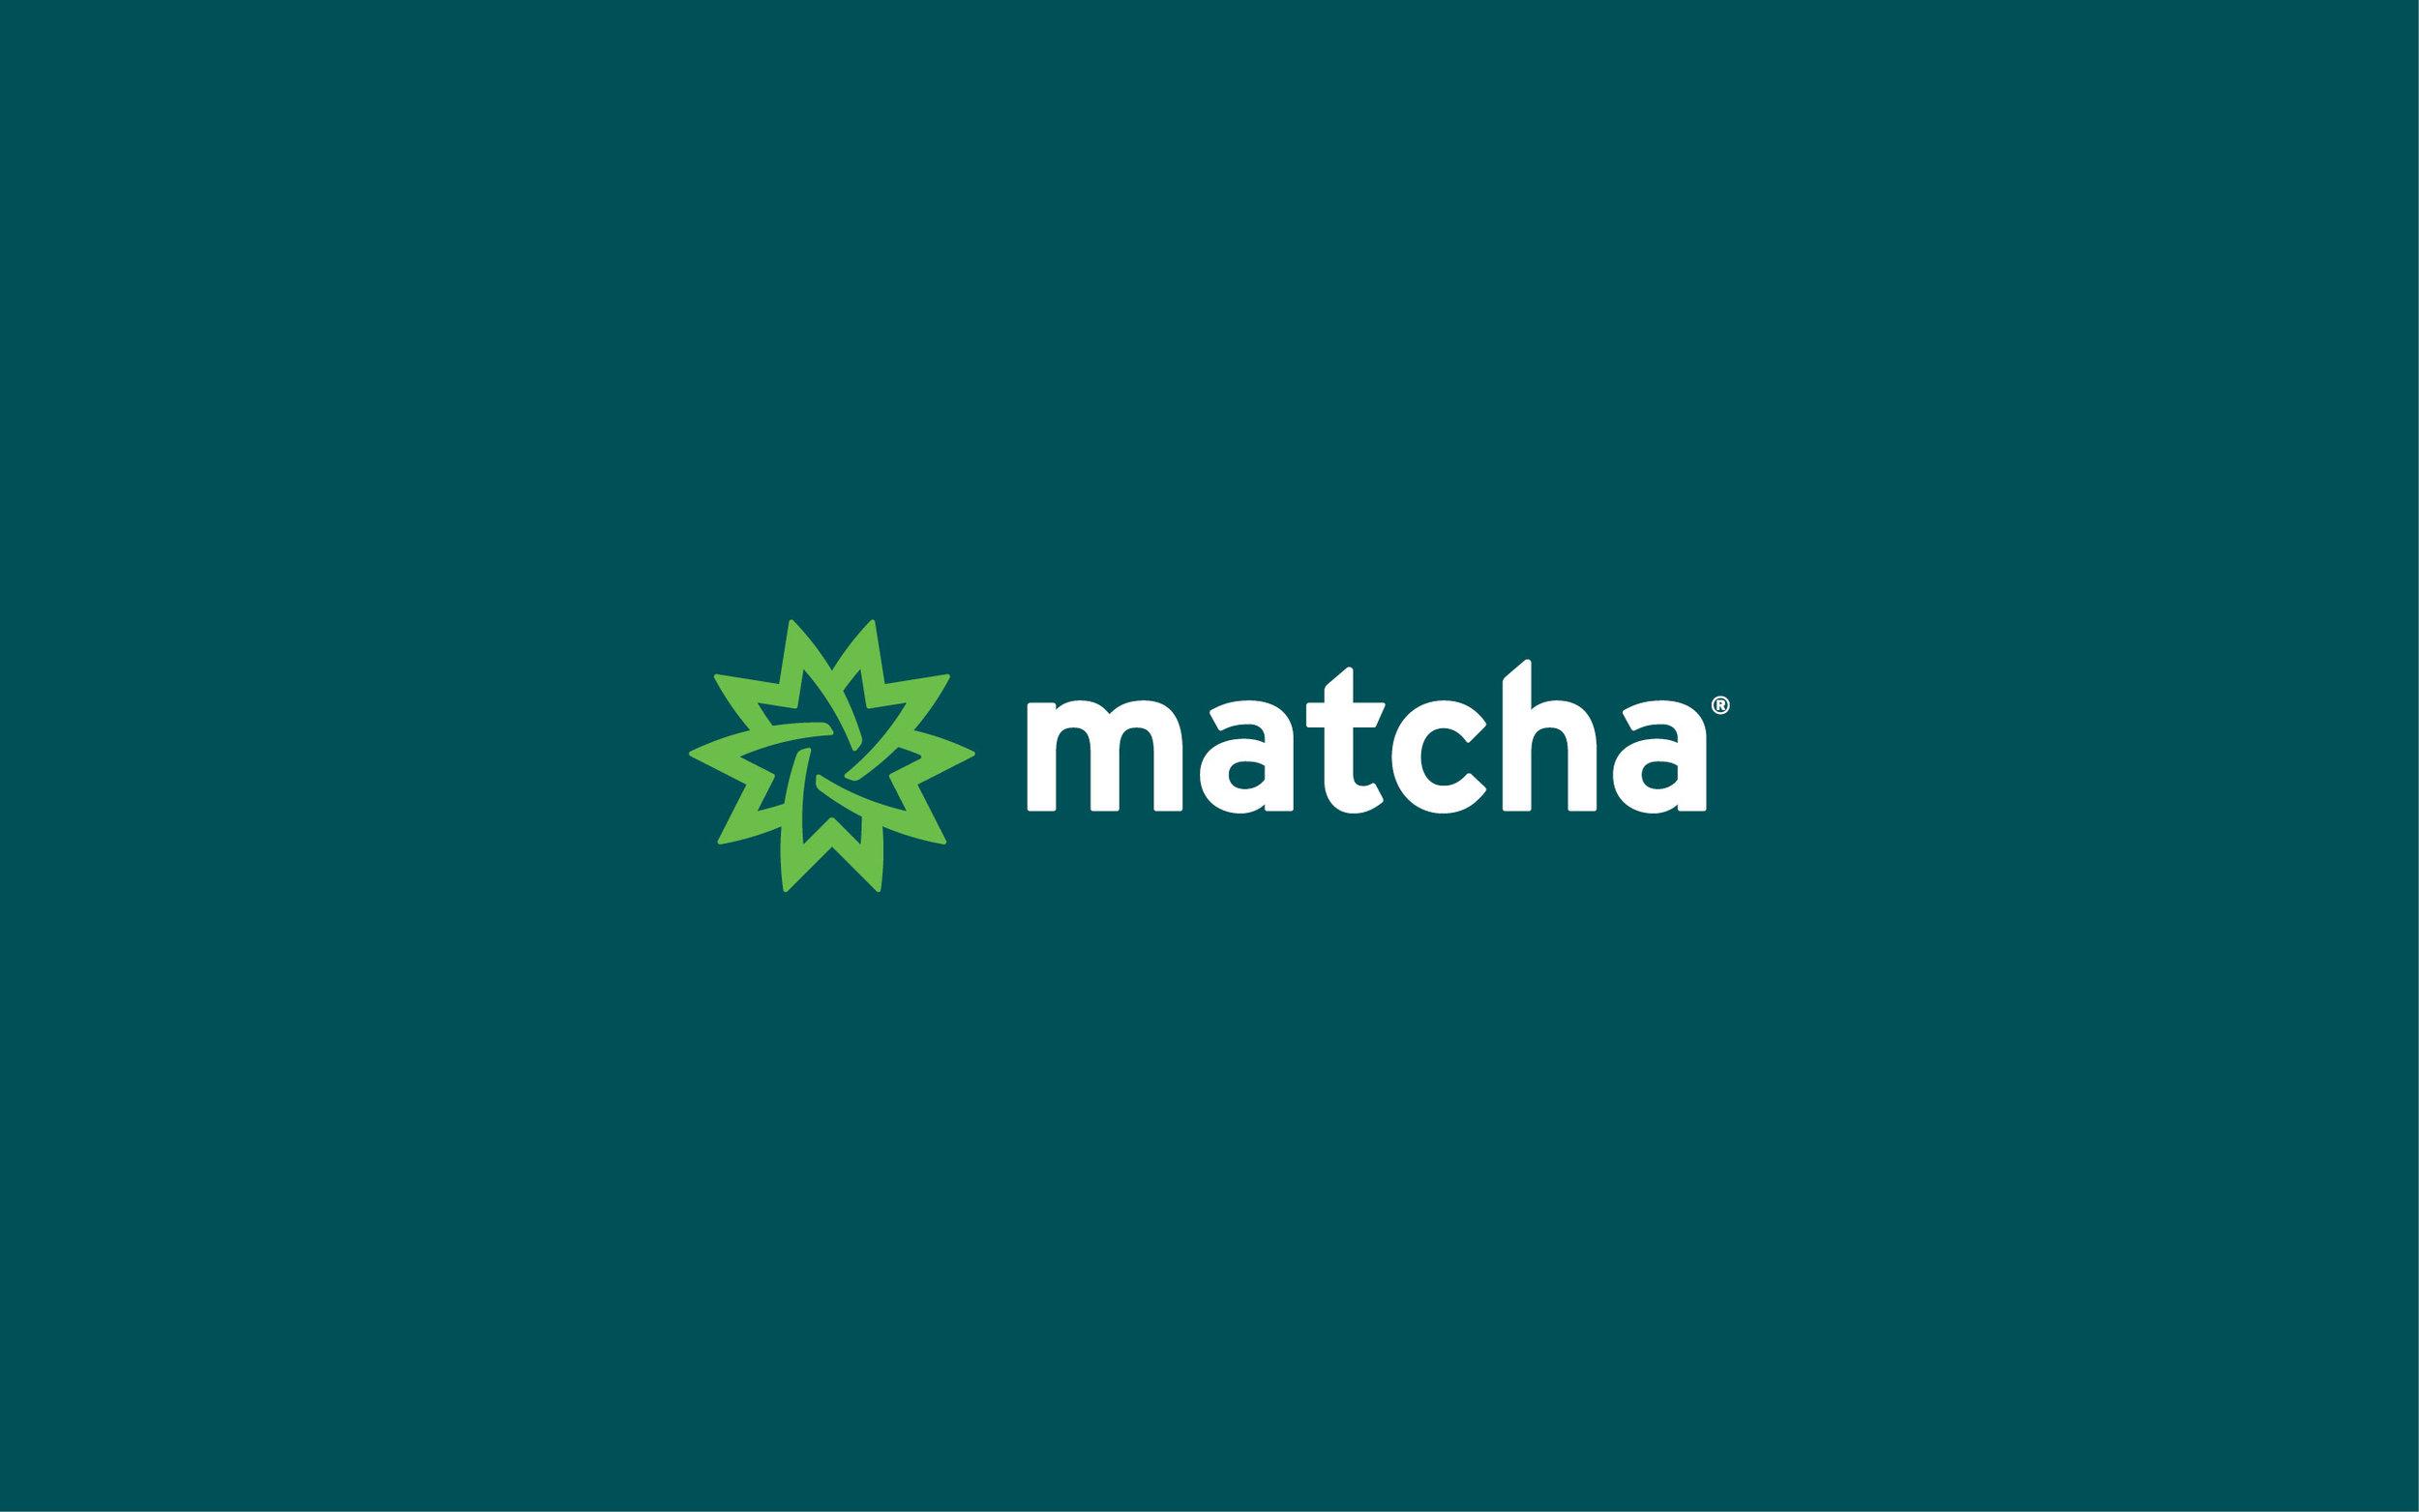 Matcha_Image.jpg